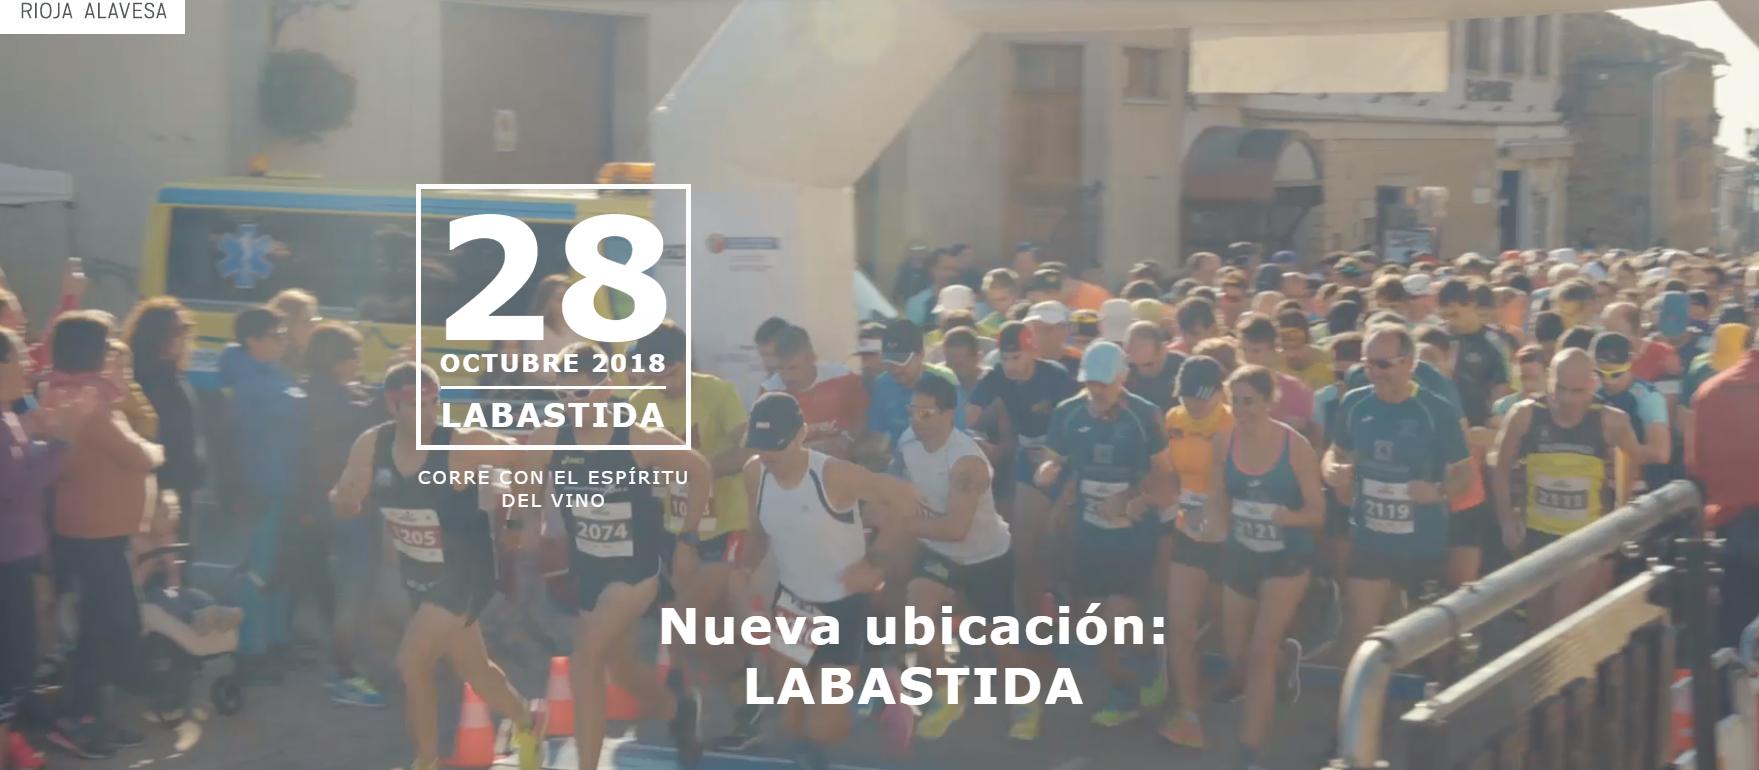 Wine Run Rioja Alavesa 2018 (Labastida)